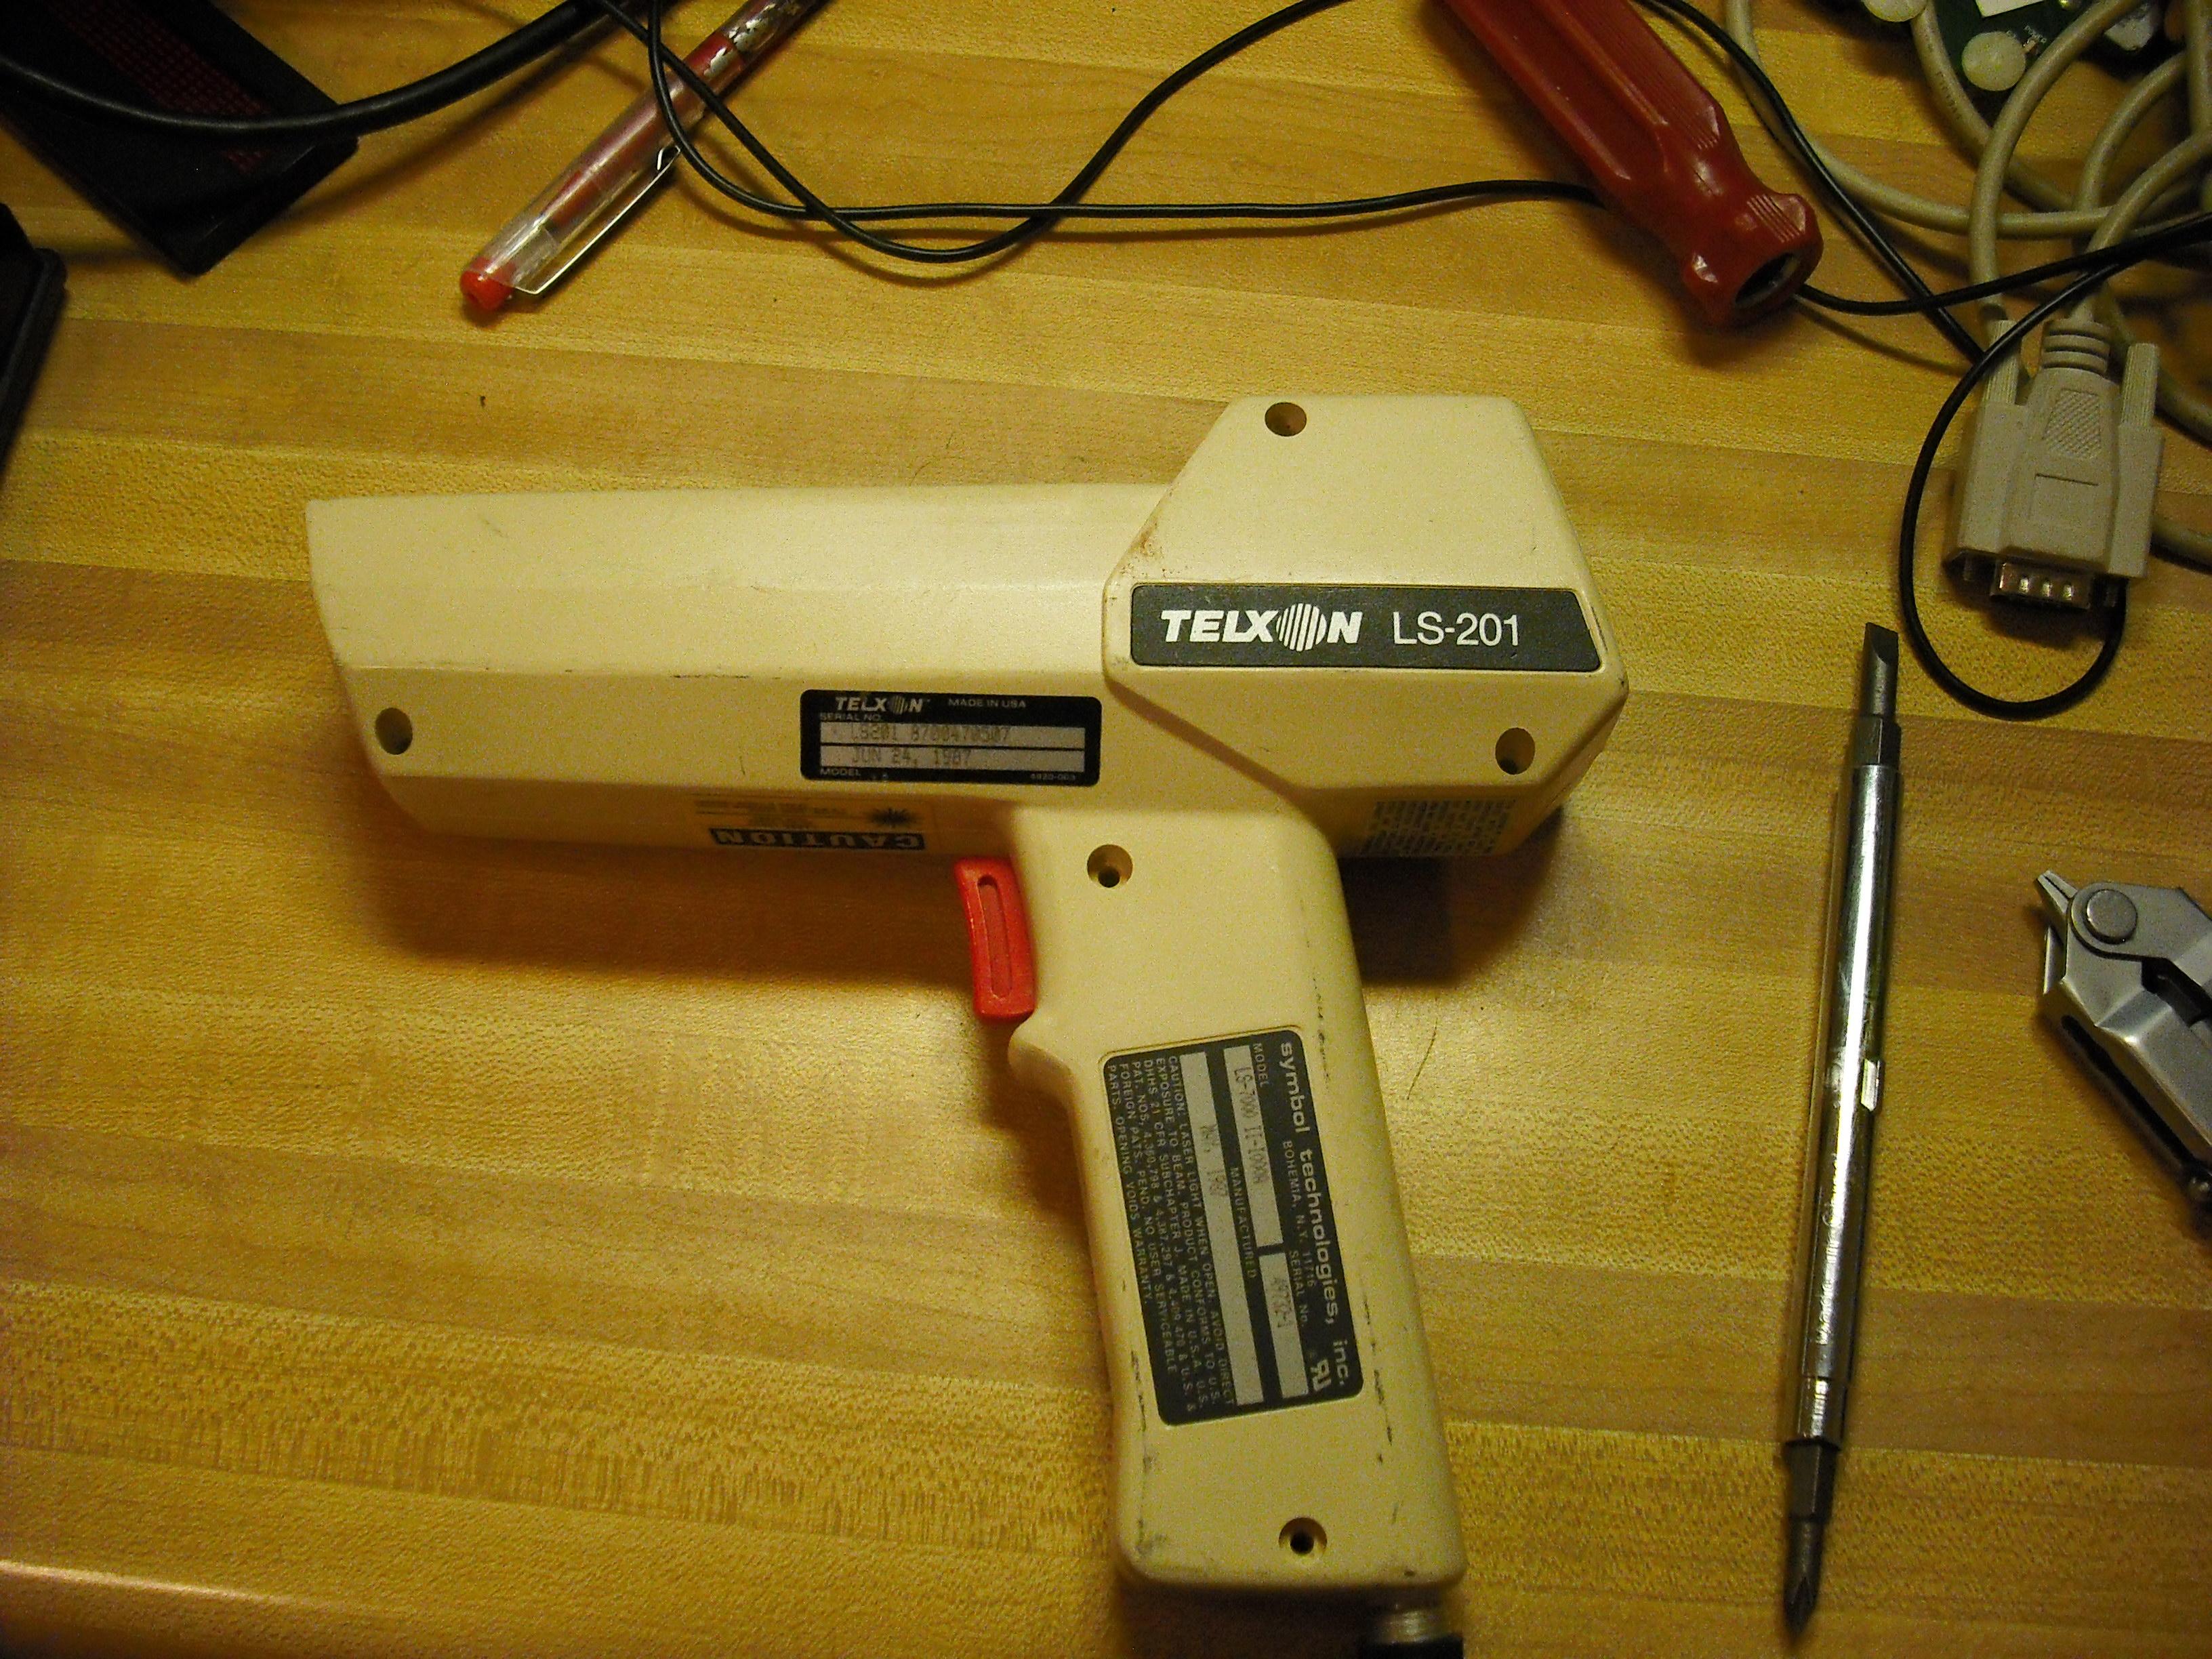 how to use a telxon gun